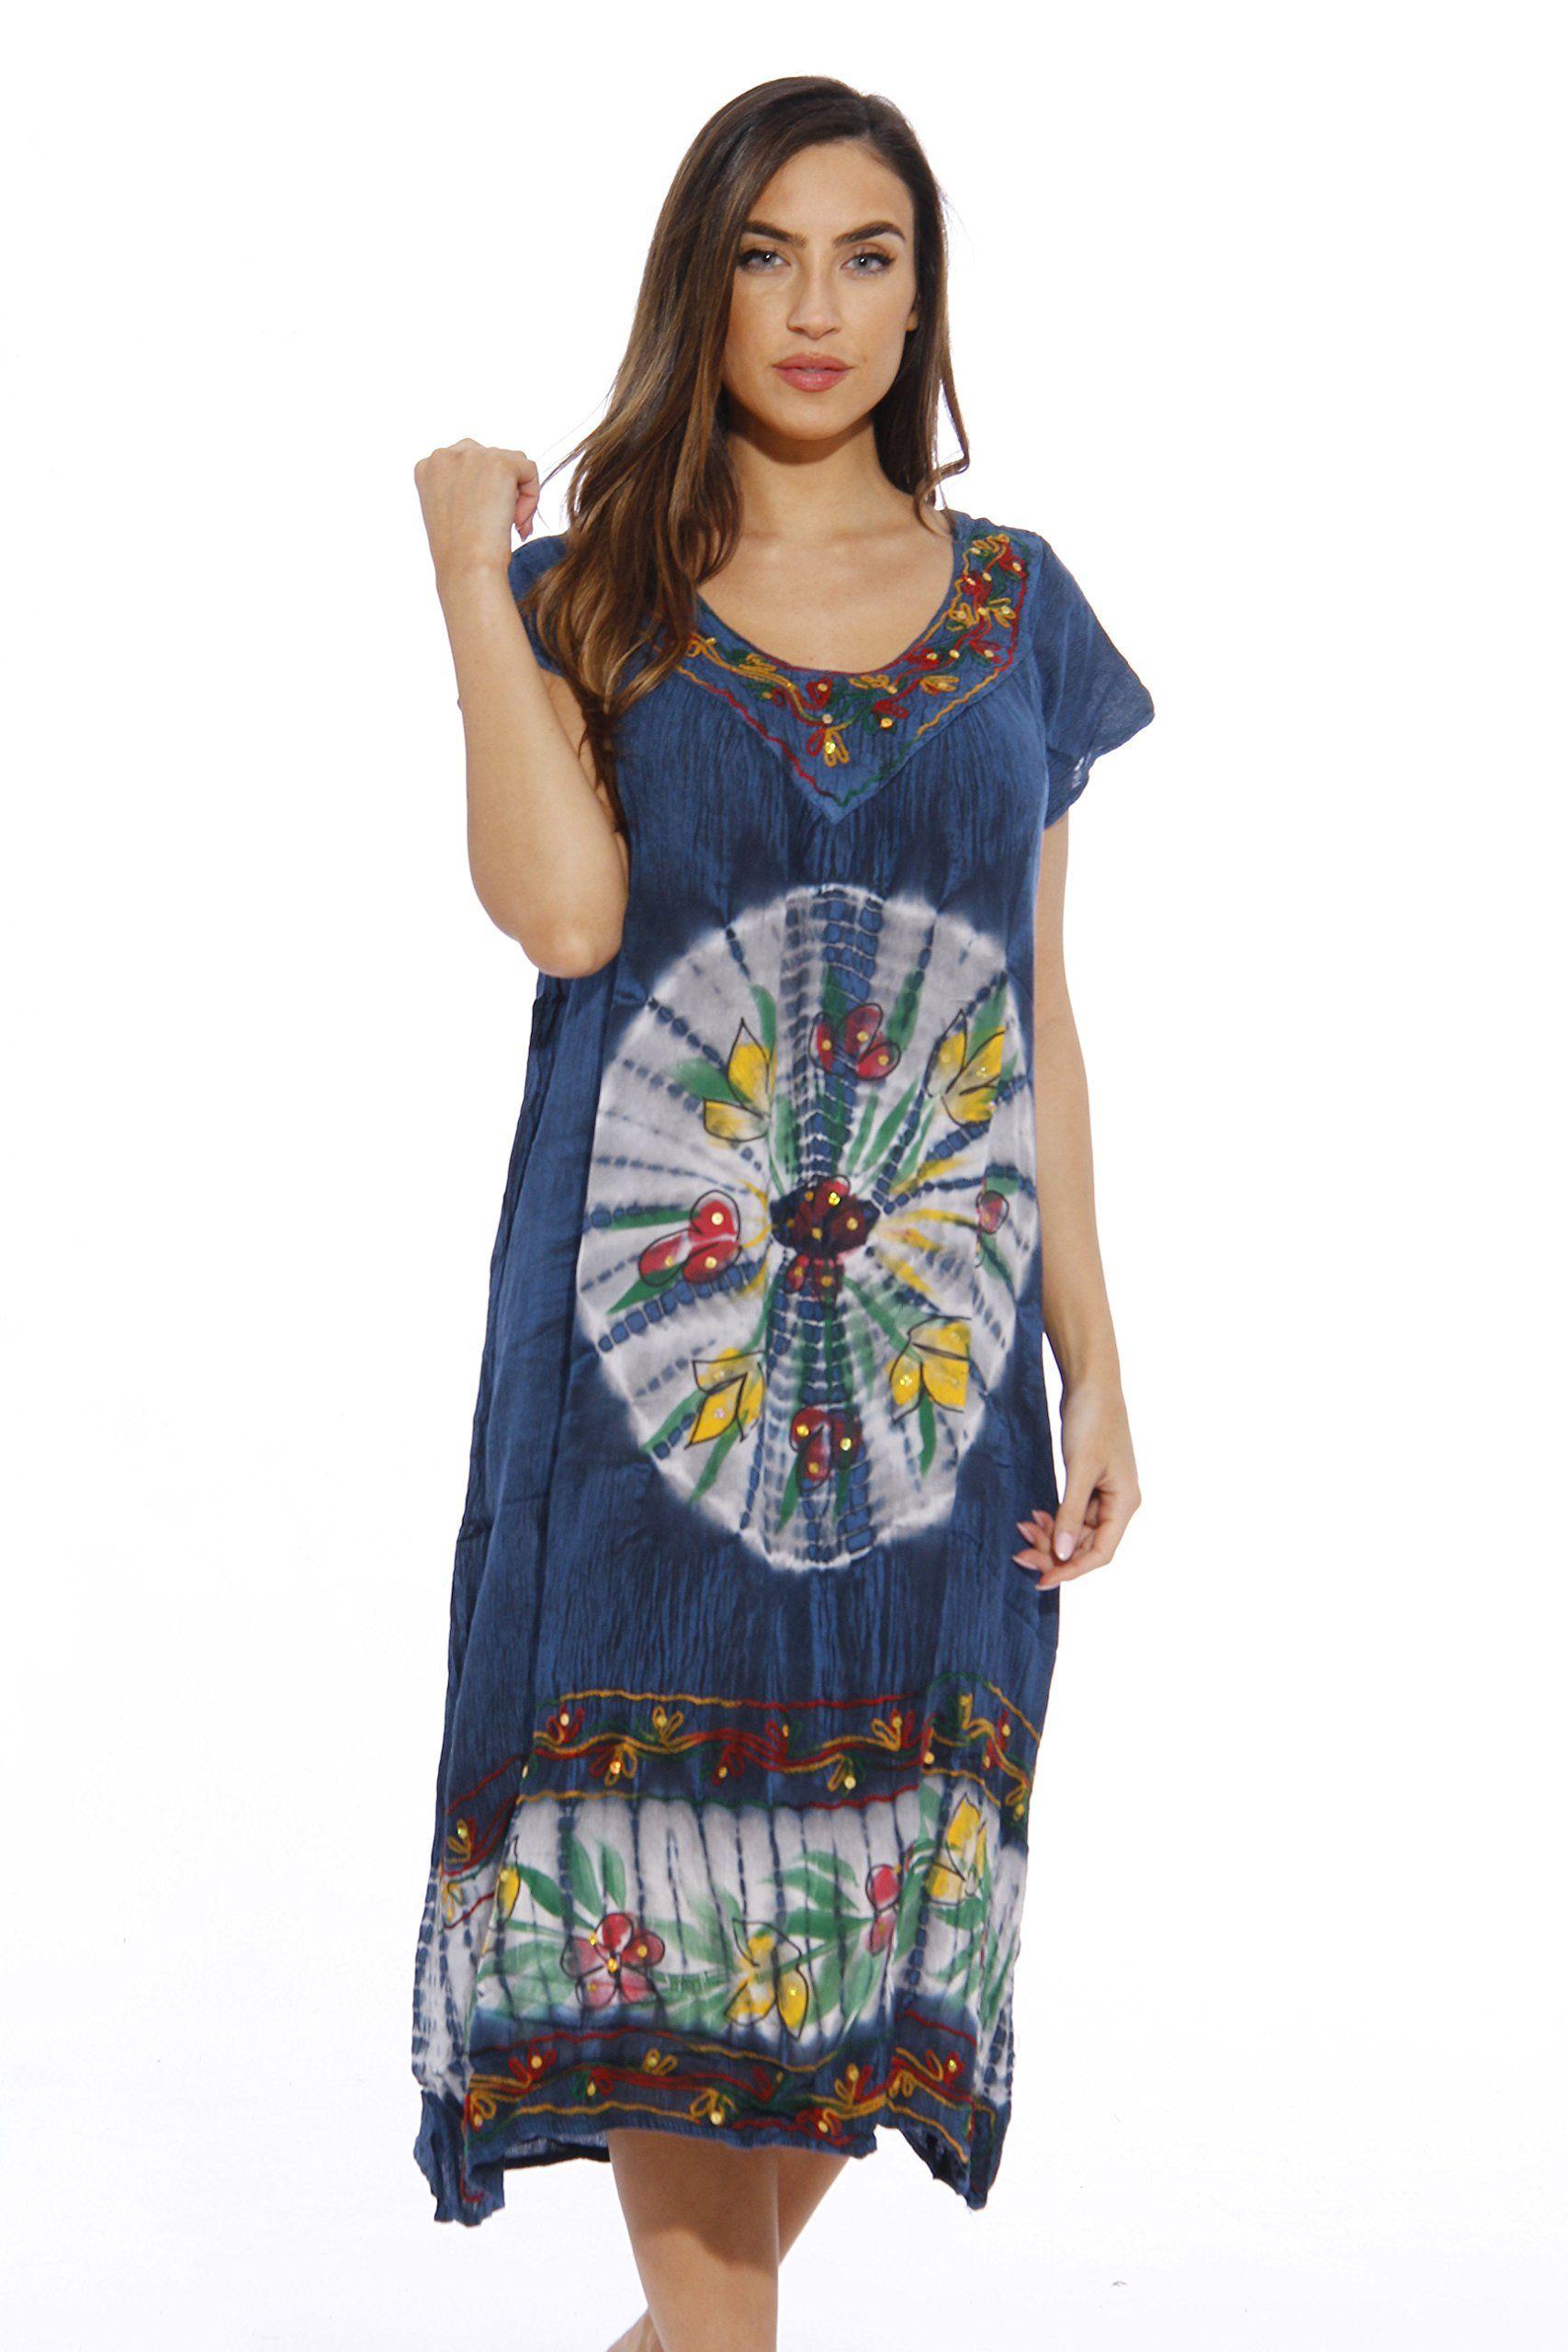 9c4f03f0f7 Riviera Sun Plus Size Summer Dresses / Swimsuit Cover Up / Resort Wear